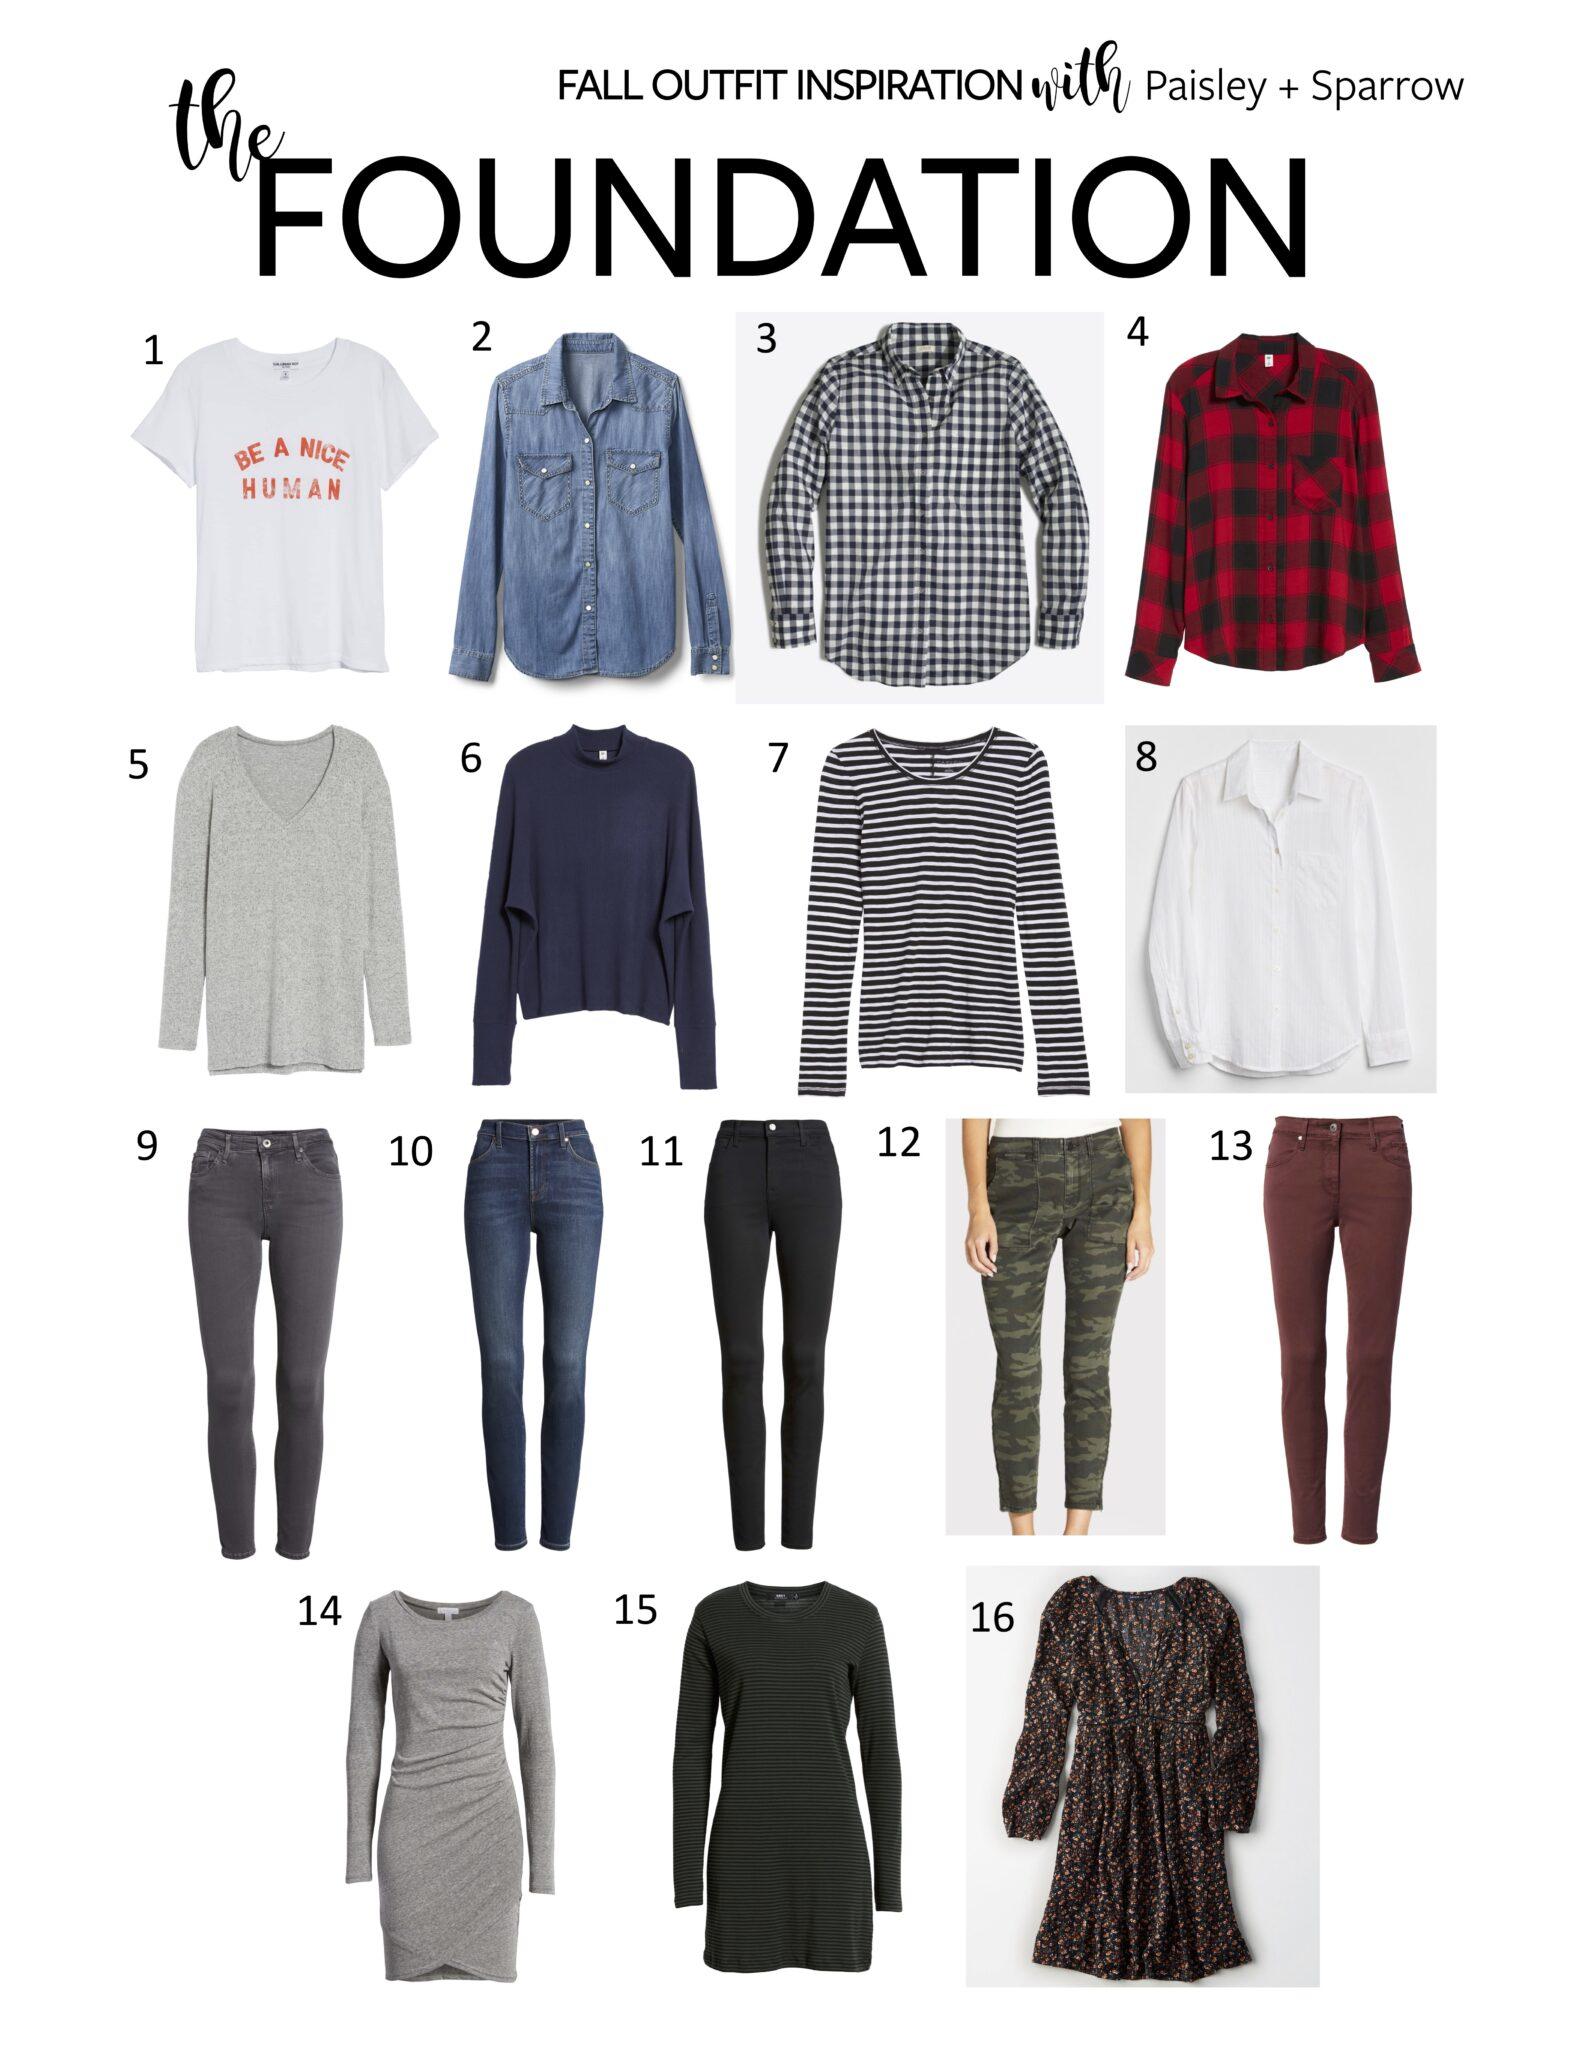 Paisley + Sparrow Fall Outfit Inspiration - Foundation Pieces e1cf8c557